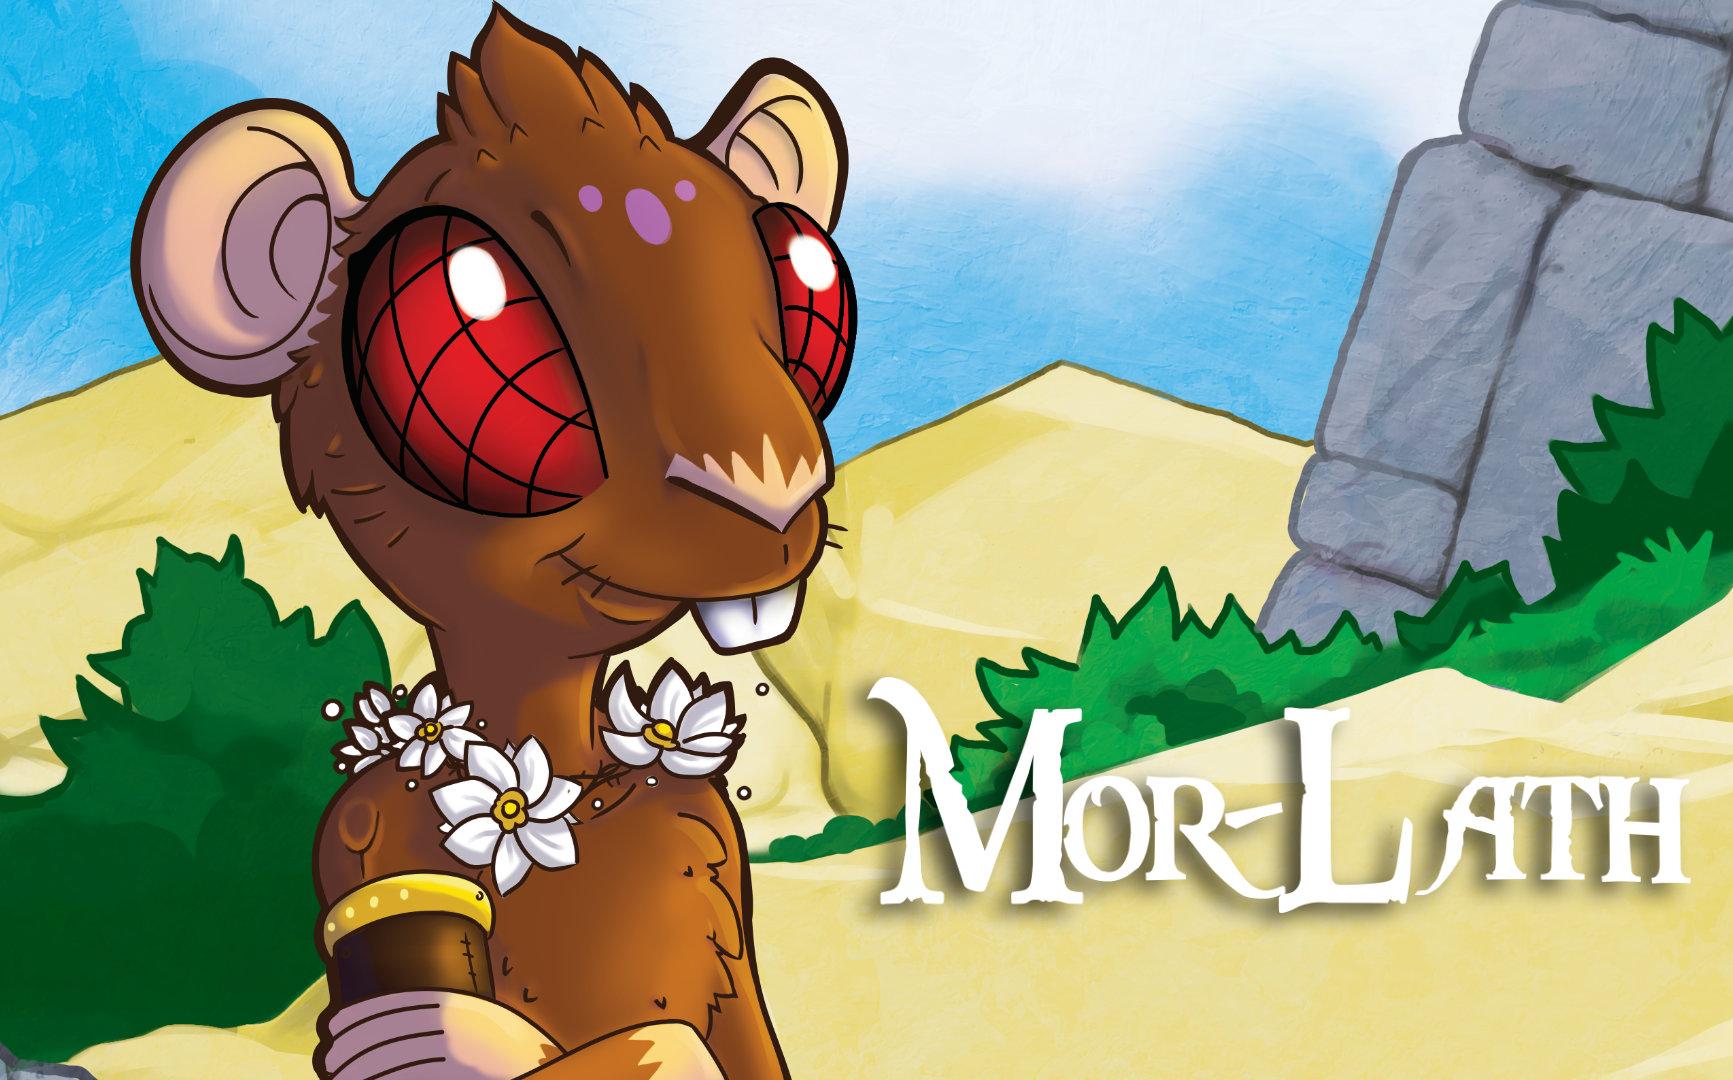 Vignette Mor-Lath